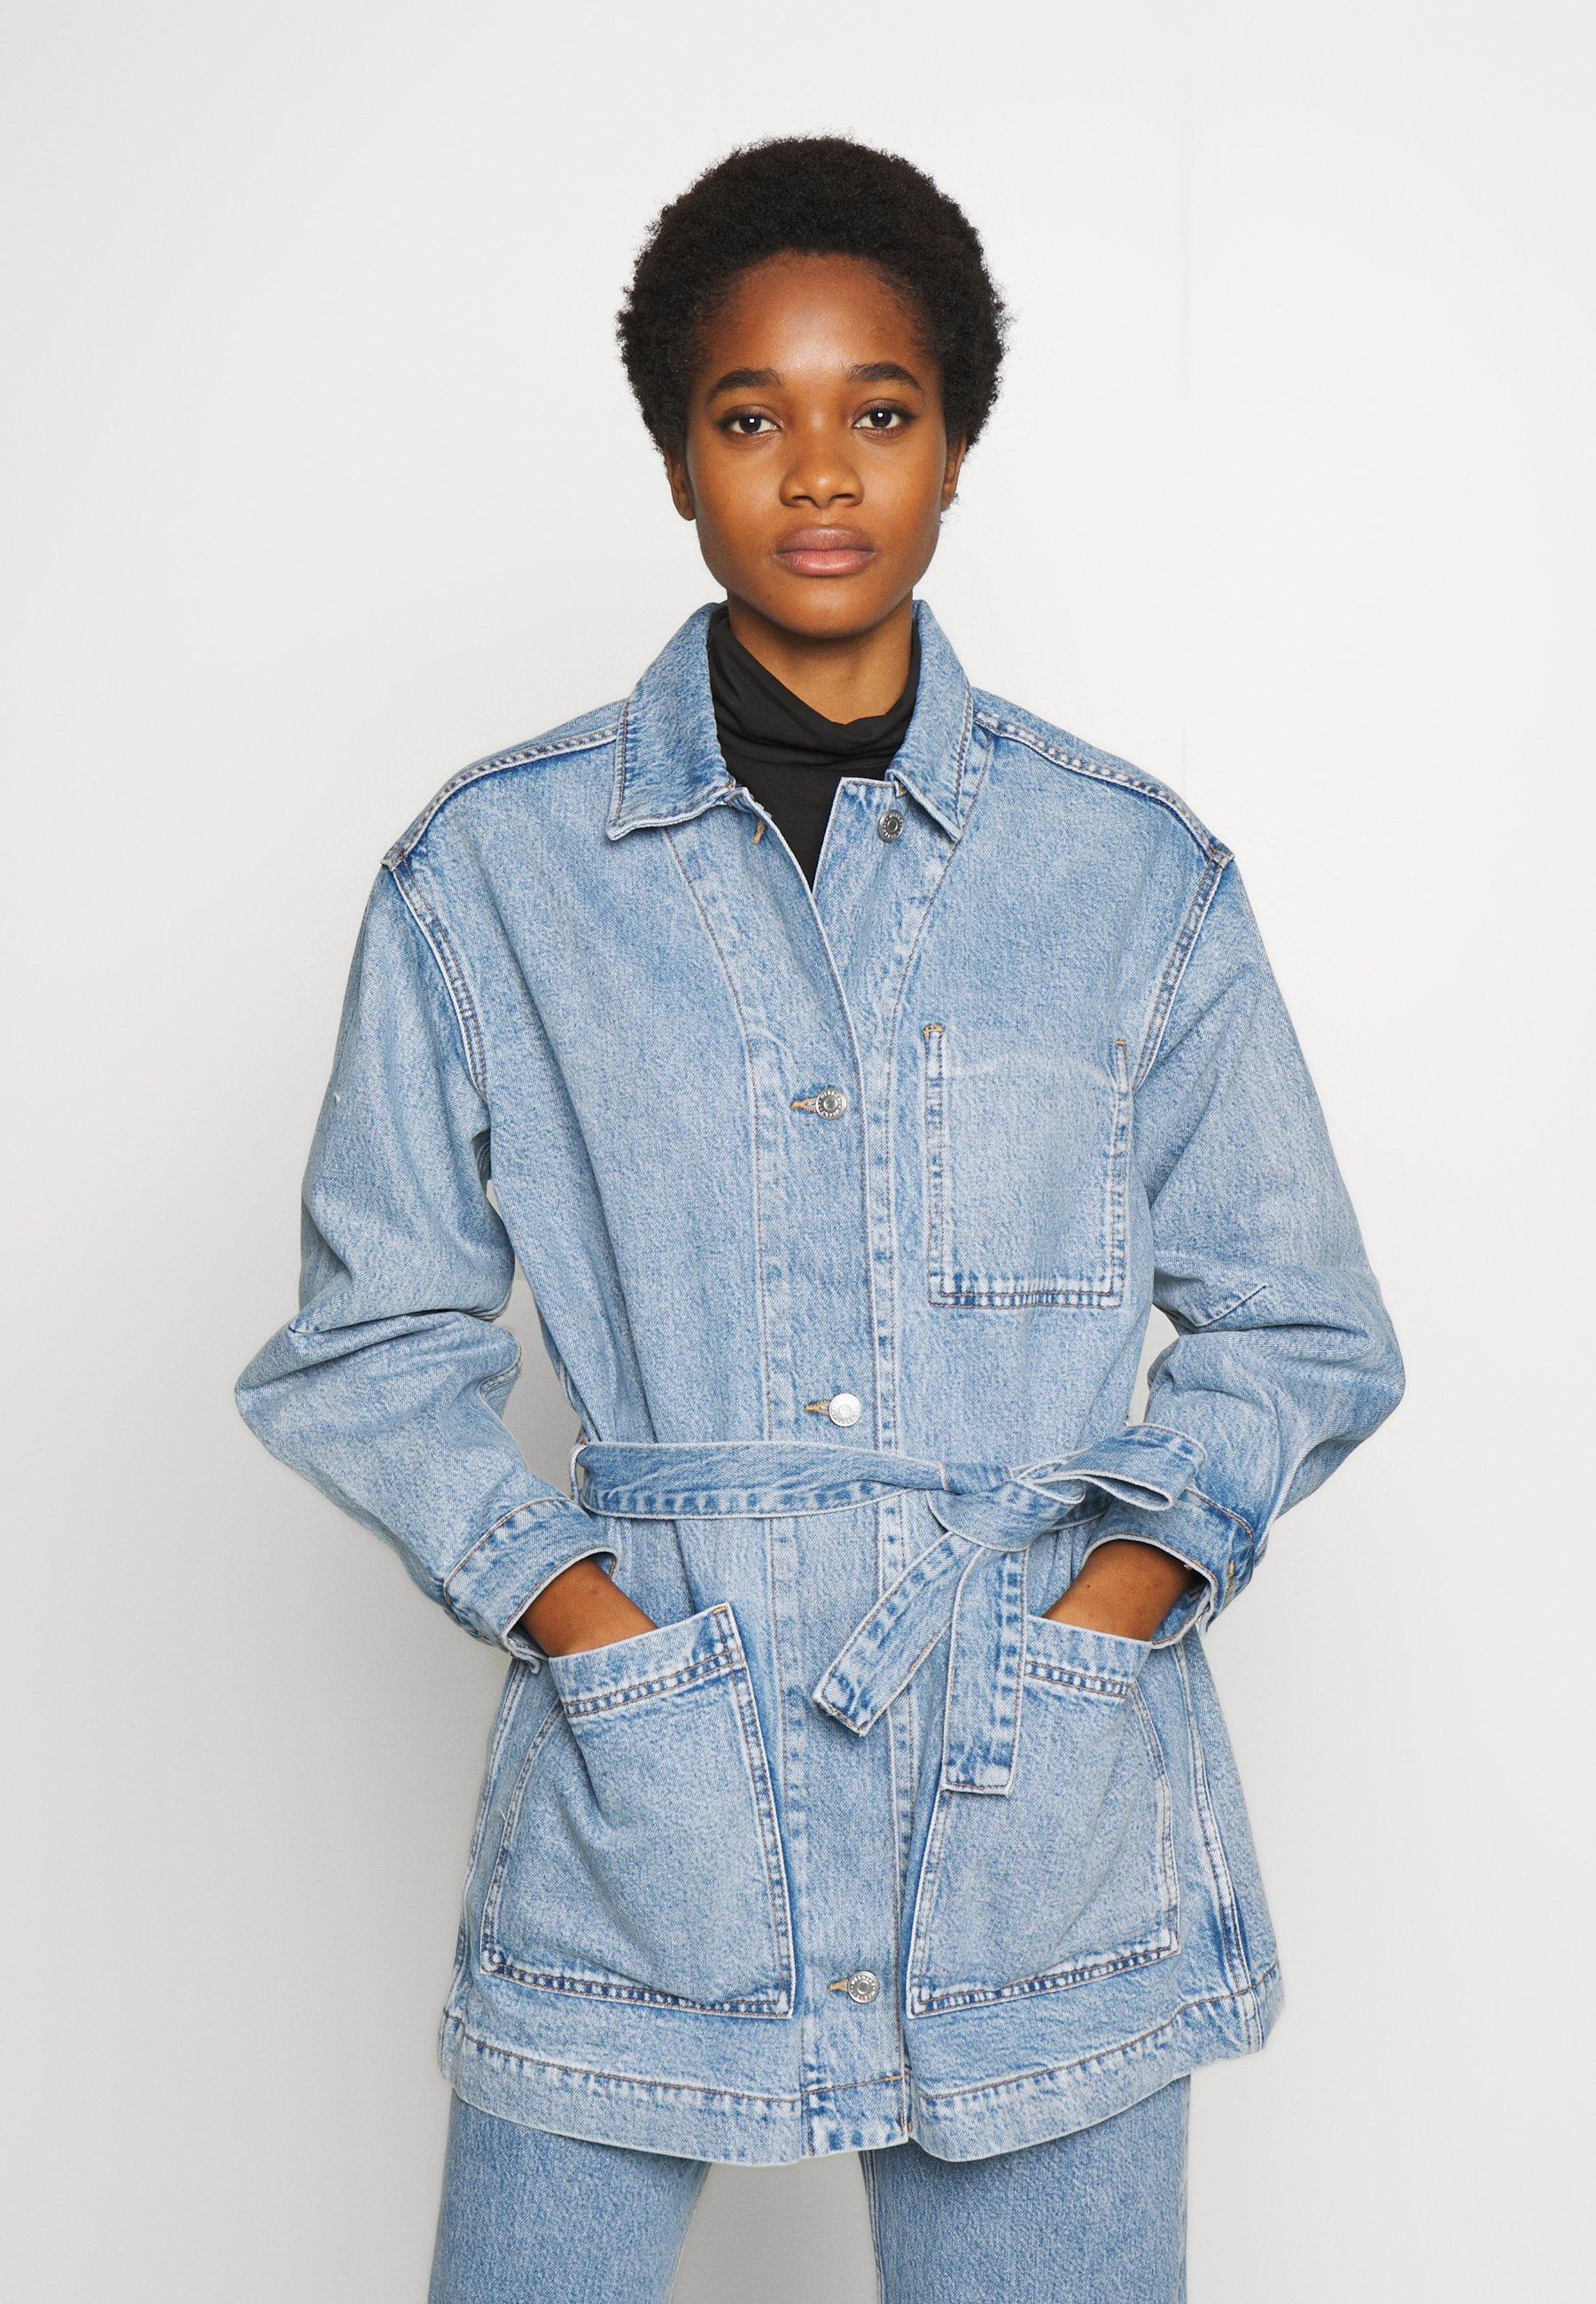 Weekday CLAY WORKER JACKET - Manteau court - pen blue - Manteaux Femme 9P93x